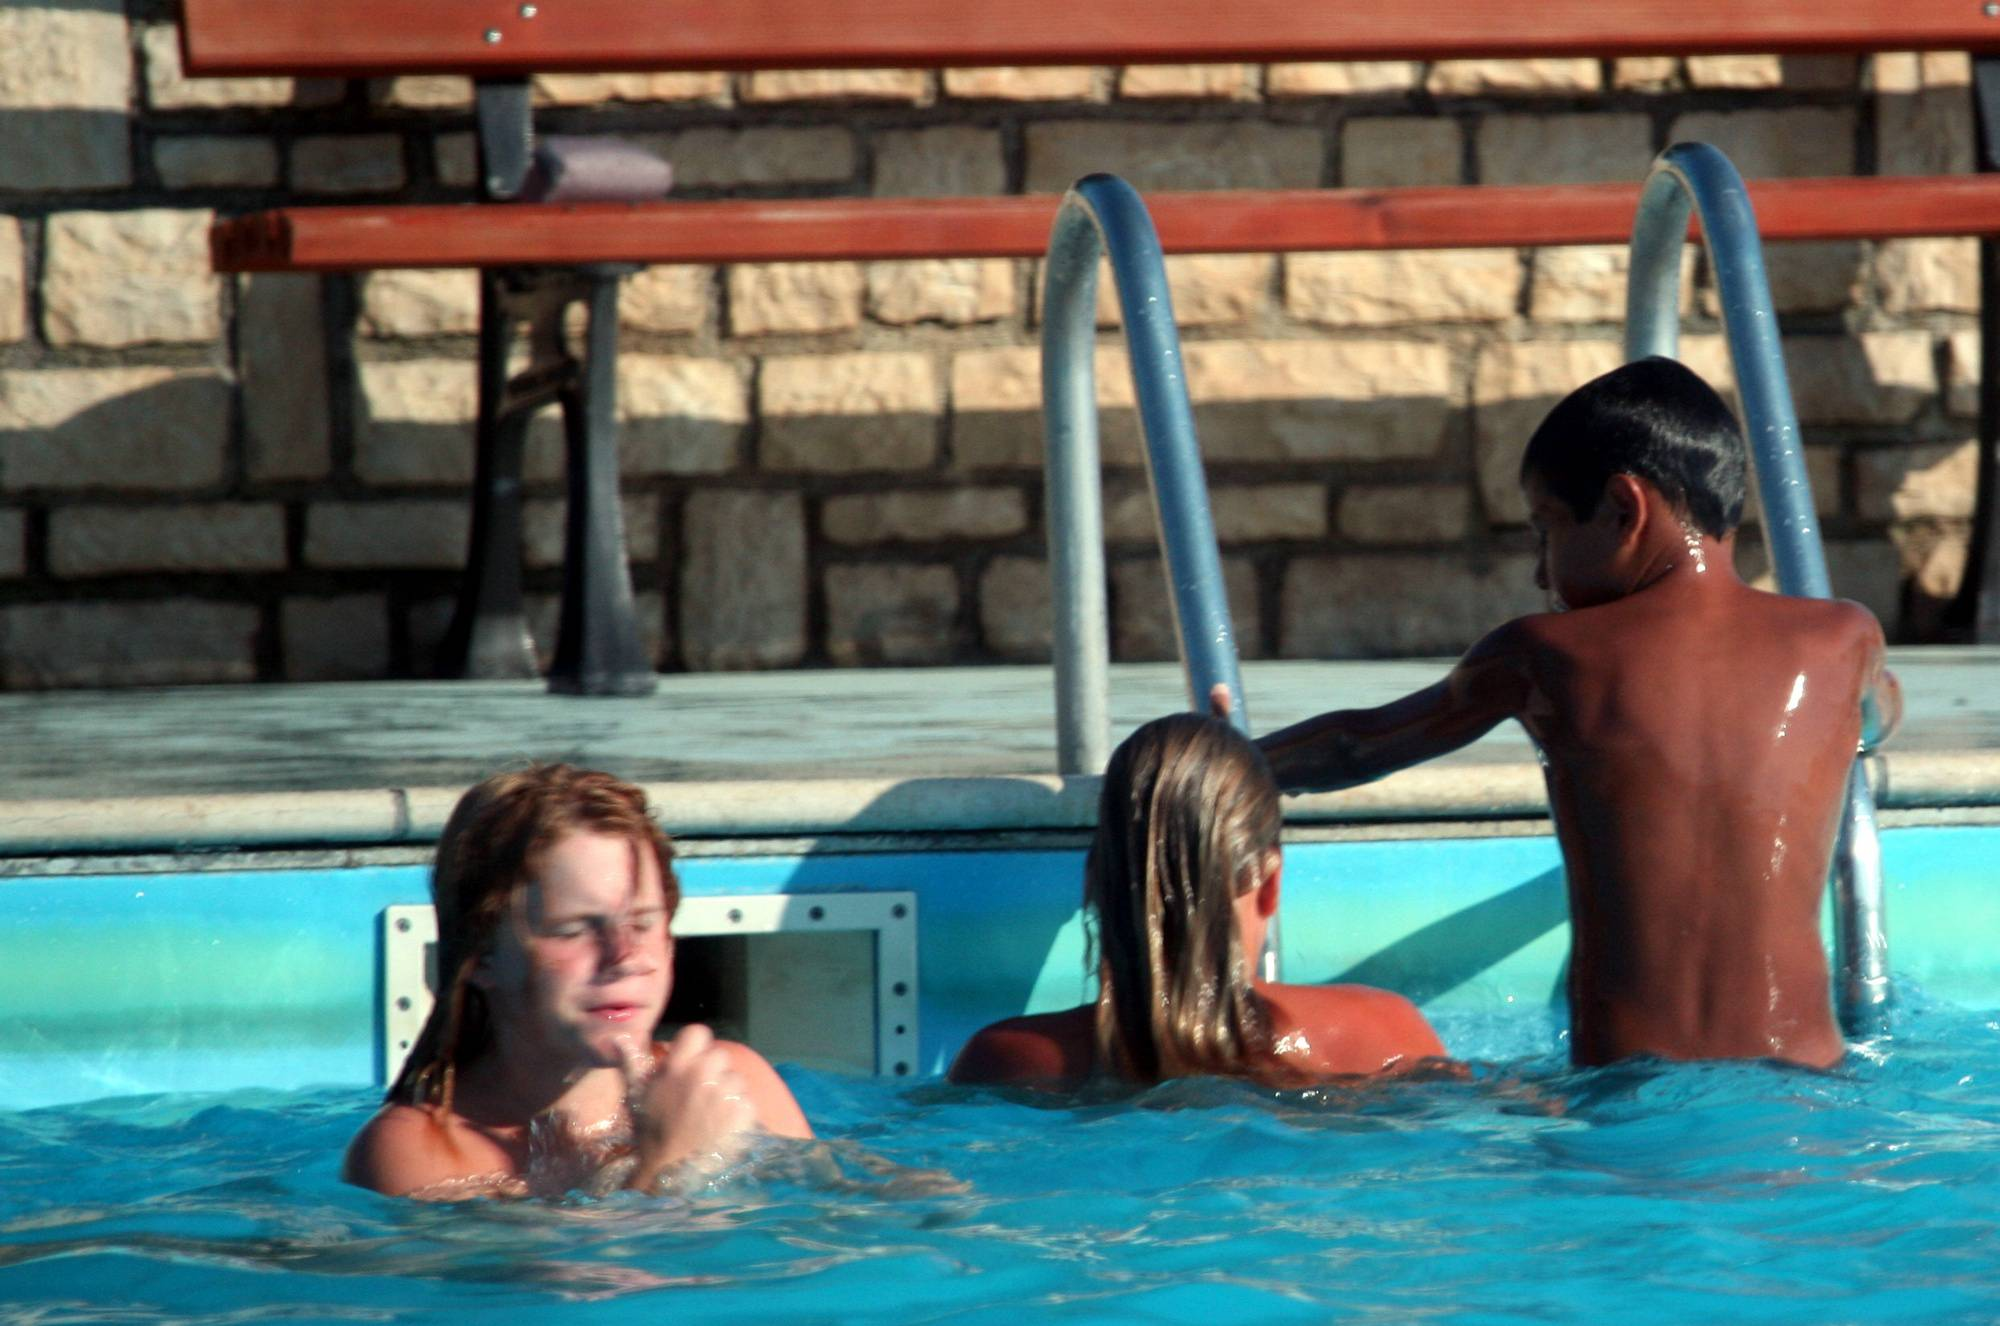 Nudist Pictures Nudist Pool Jumping Time - 1